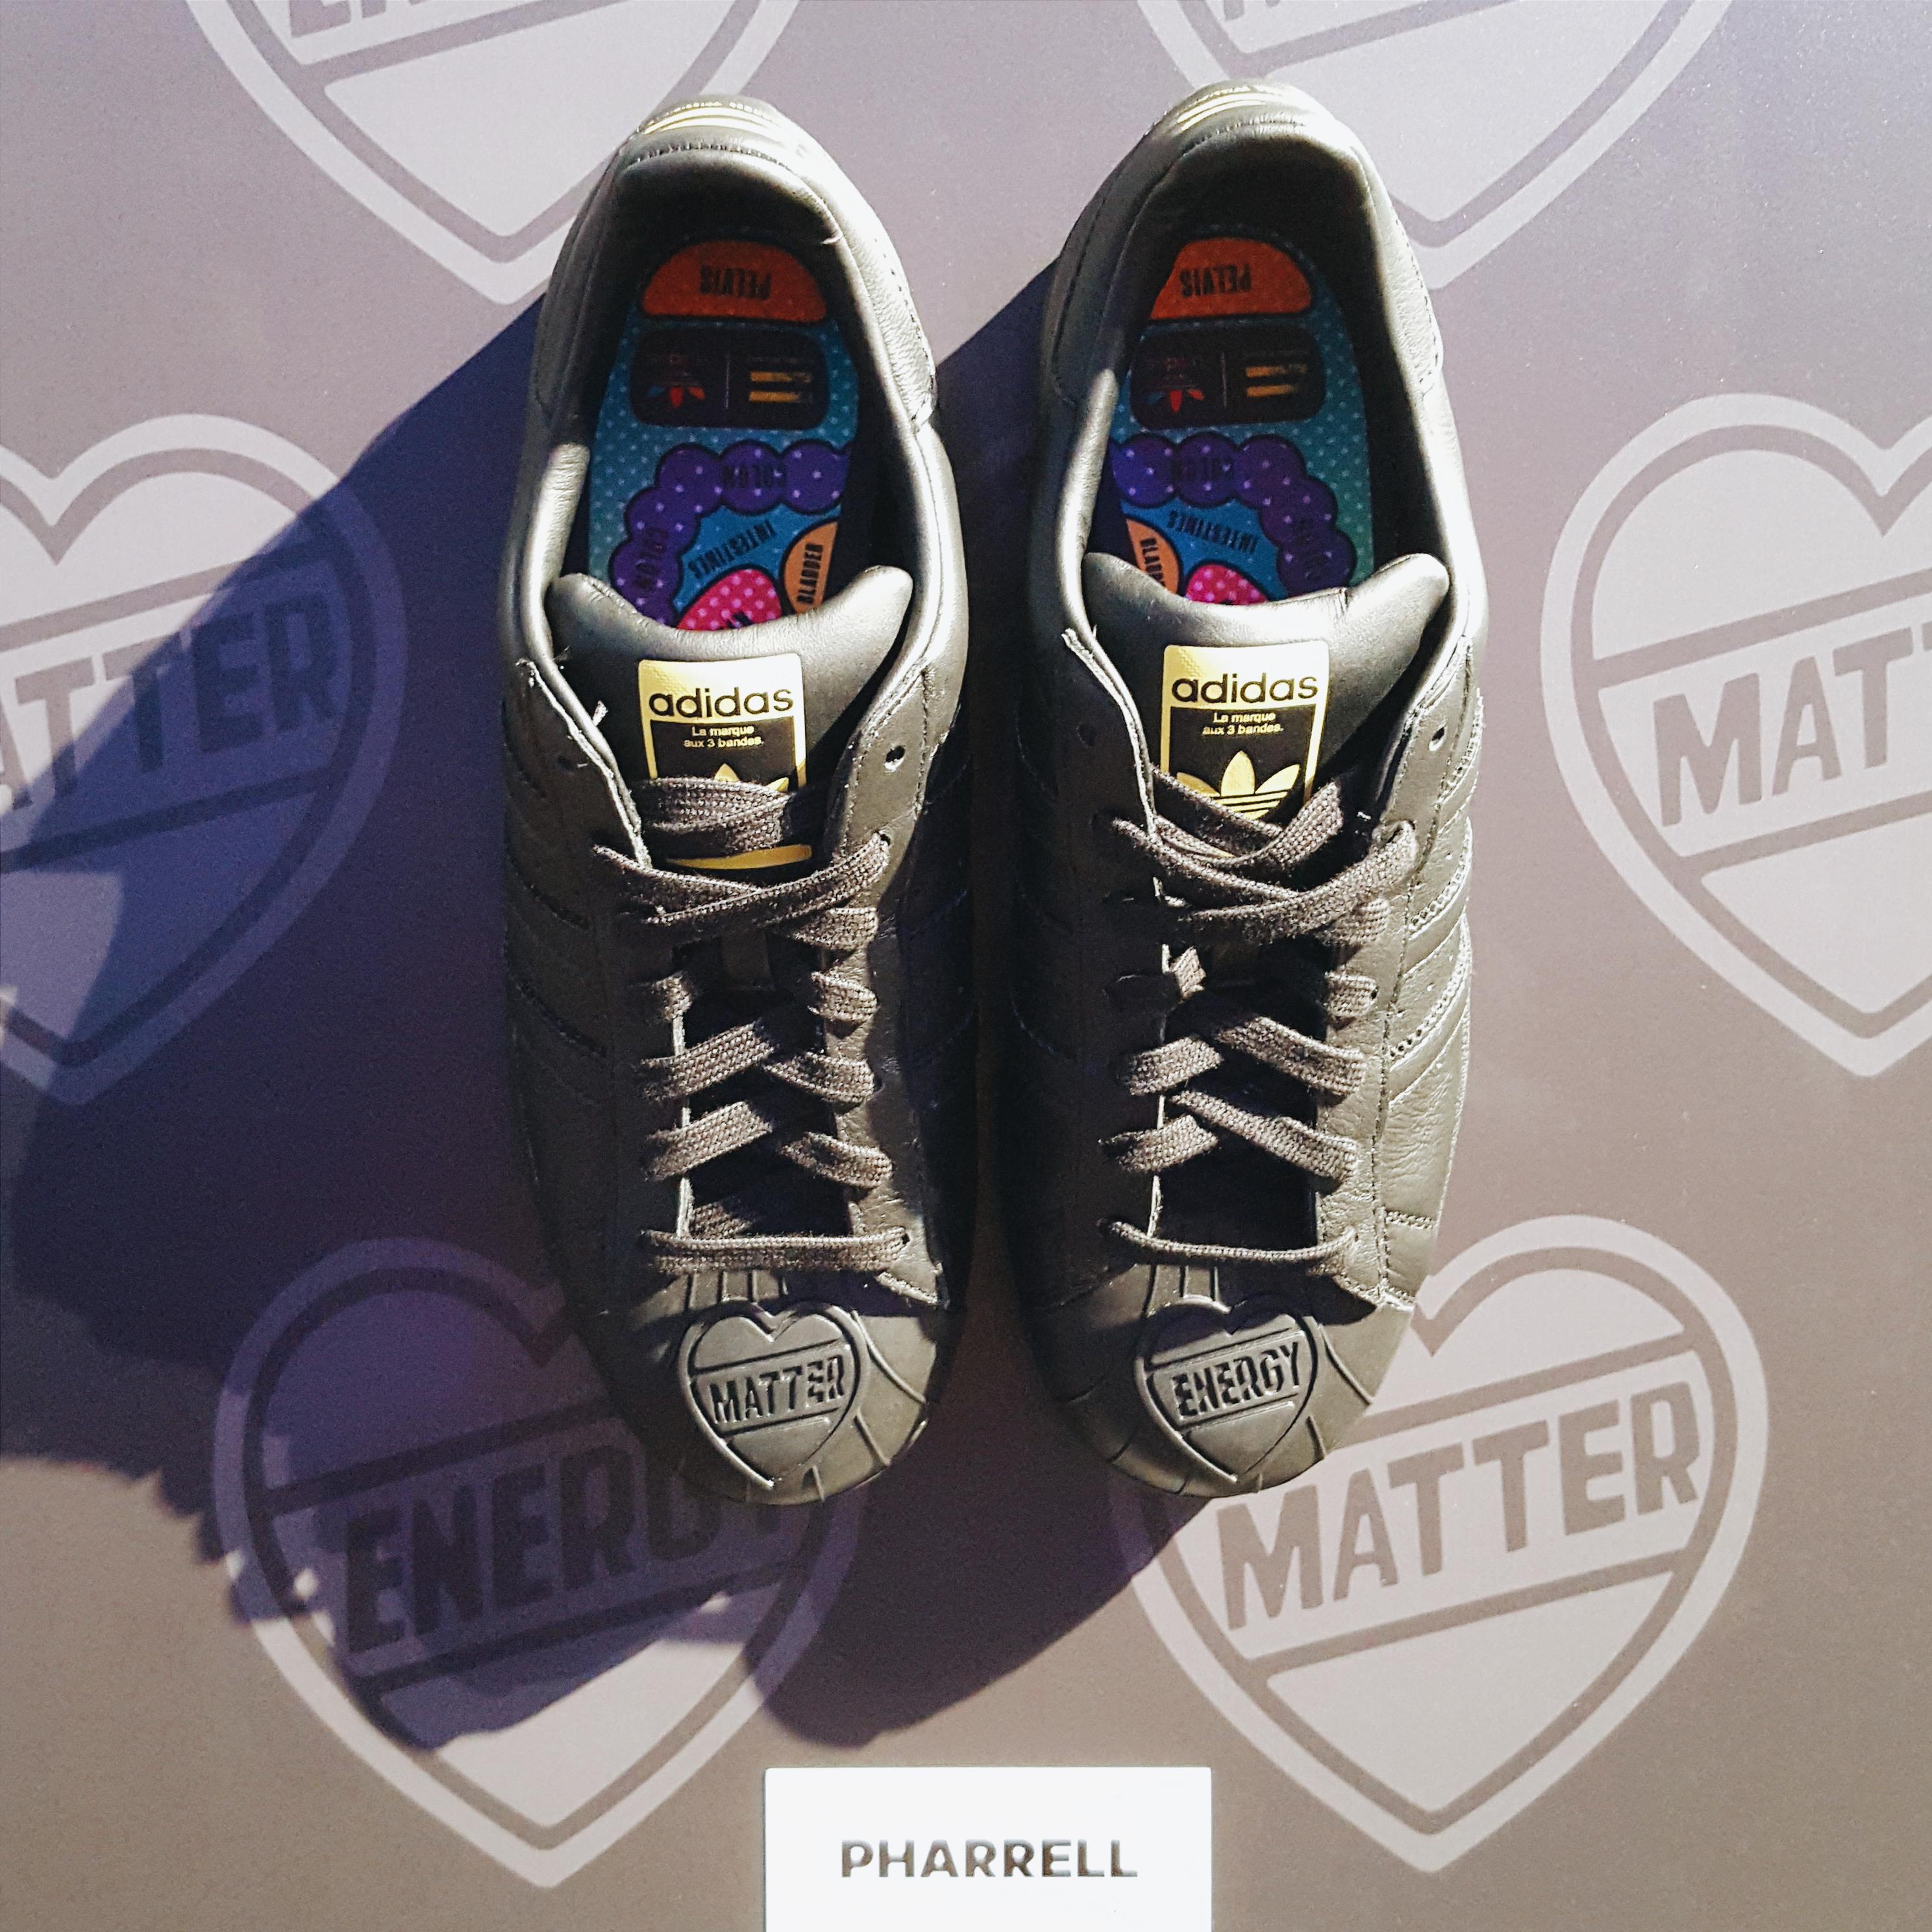 sale retailer 672bc 43dde RECAP adidas Originals X Pharrell Present OriginalSuperstar at Milk  Studios